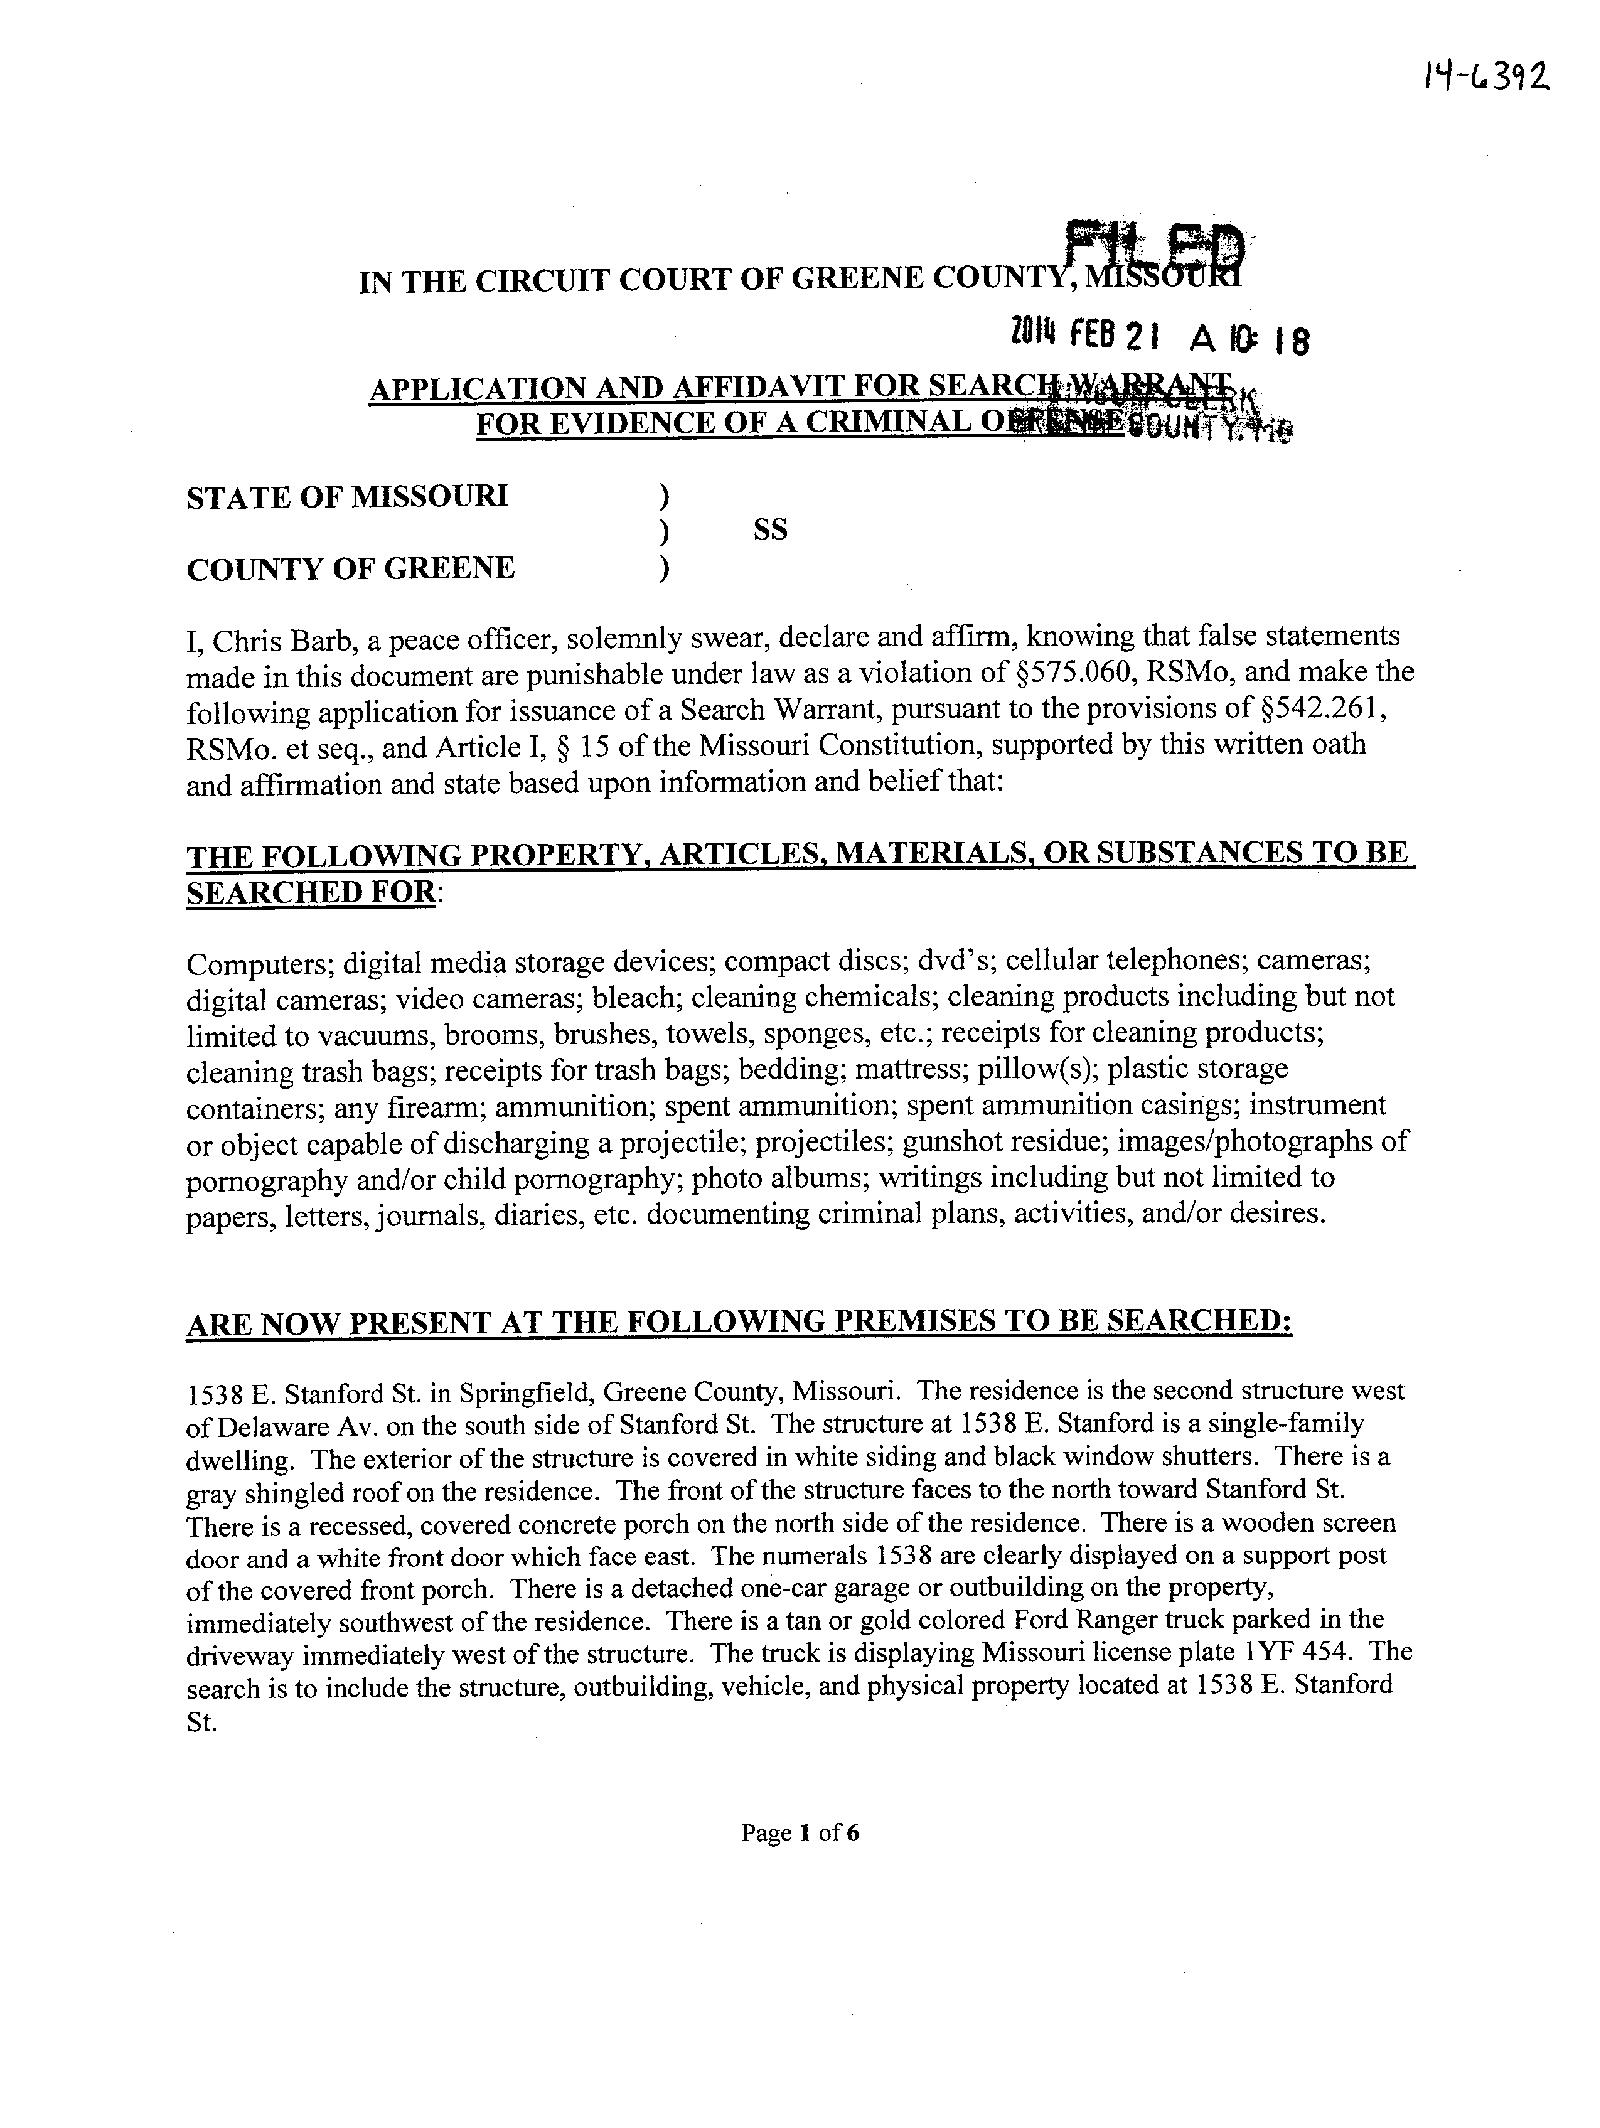 Missouri Warrant Search – Outstanding & Active Warrants in ...